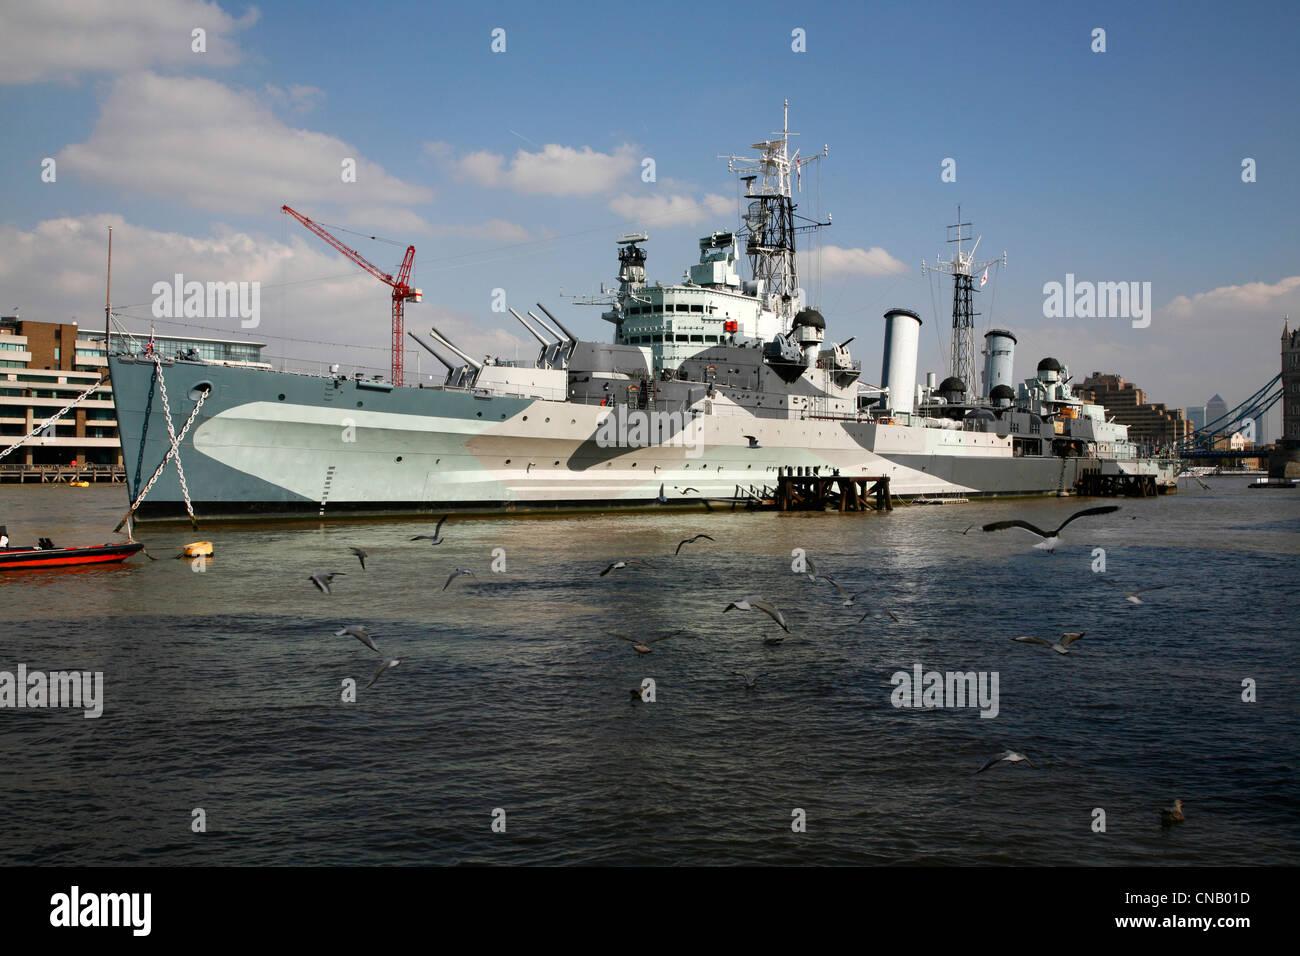 HMS Belfast moored on the River Thames near London Bridge, London, UK - Stock Image